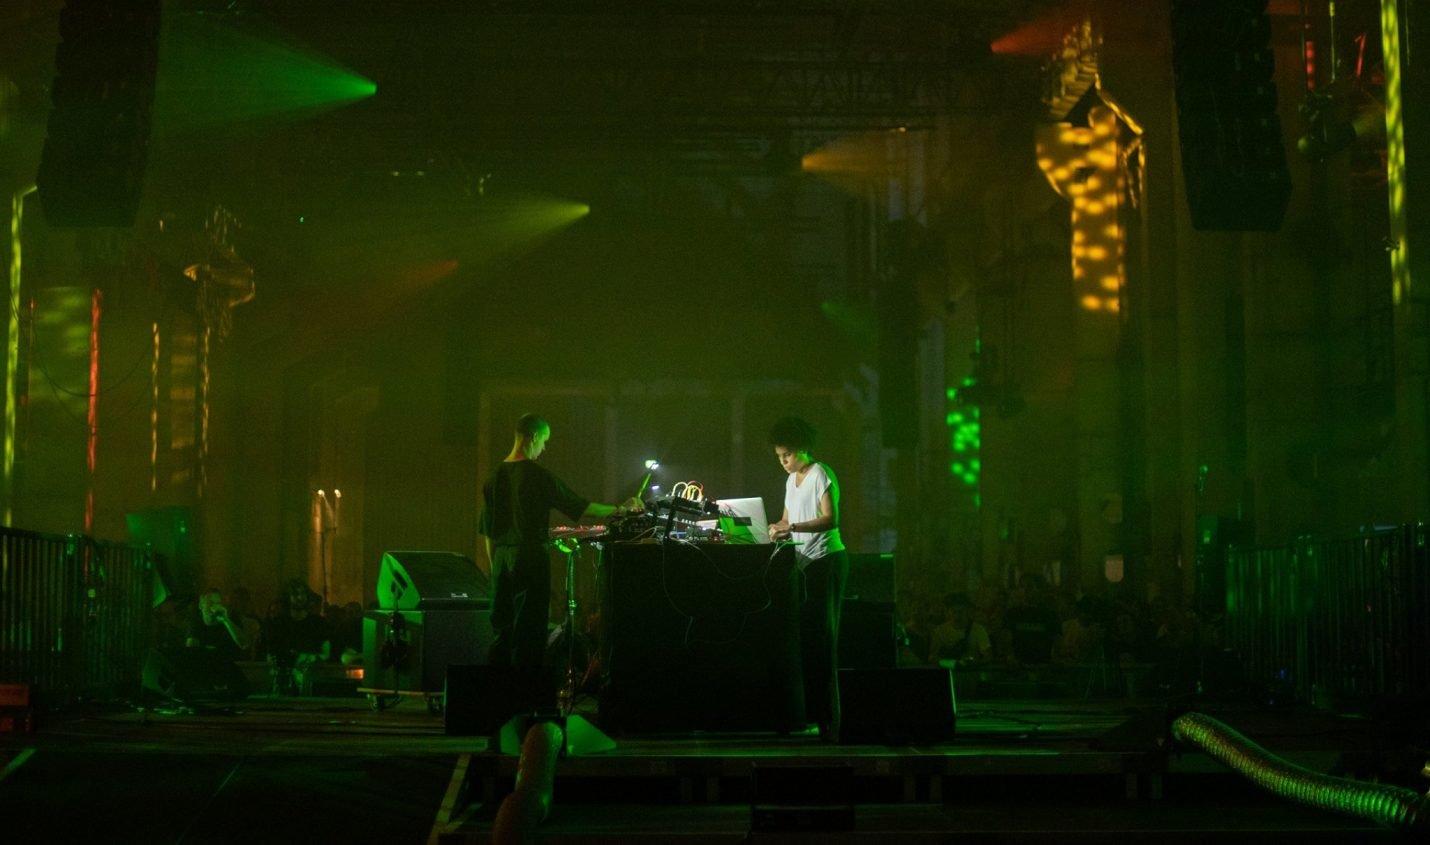 Atonal Festival: Neue Kollektion mit Musik, Kunst & Merch